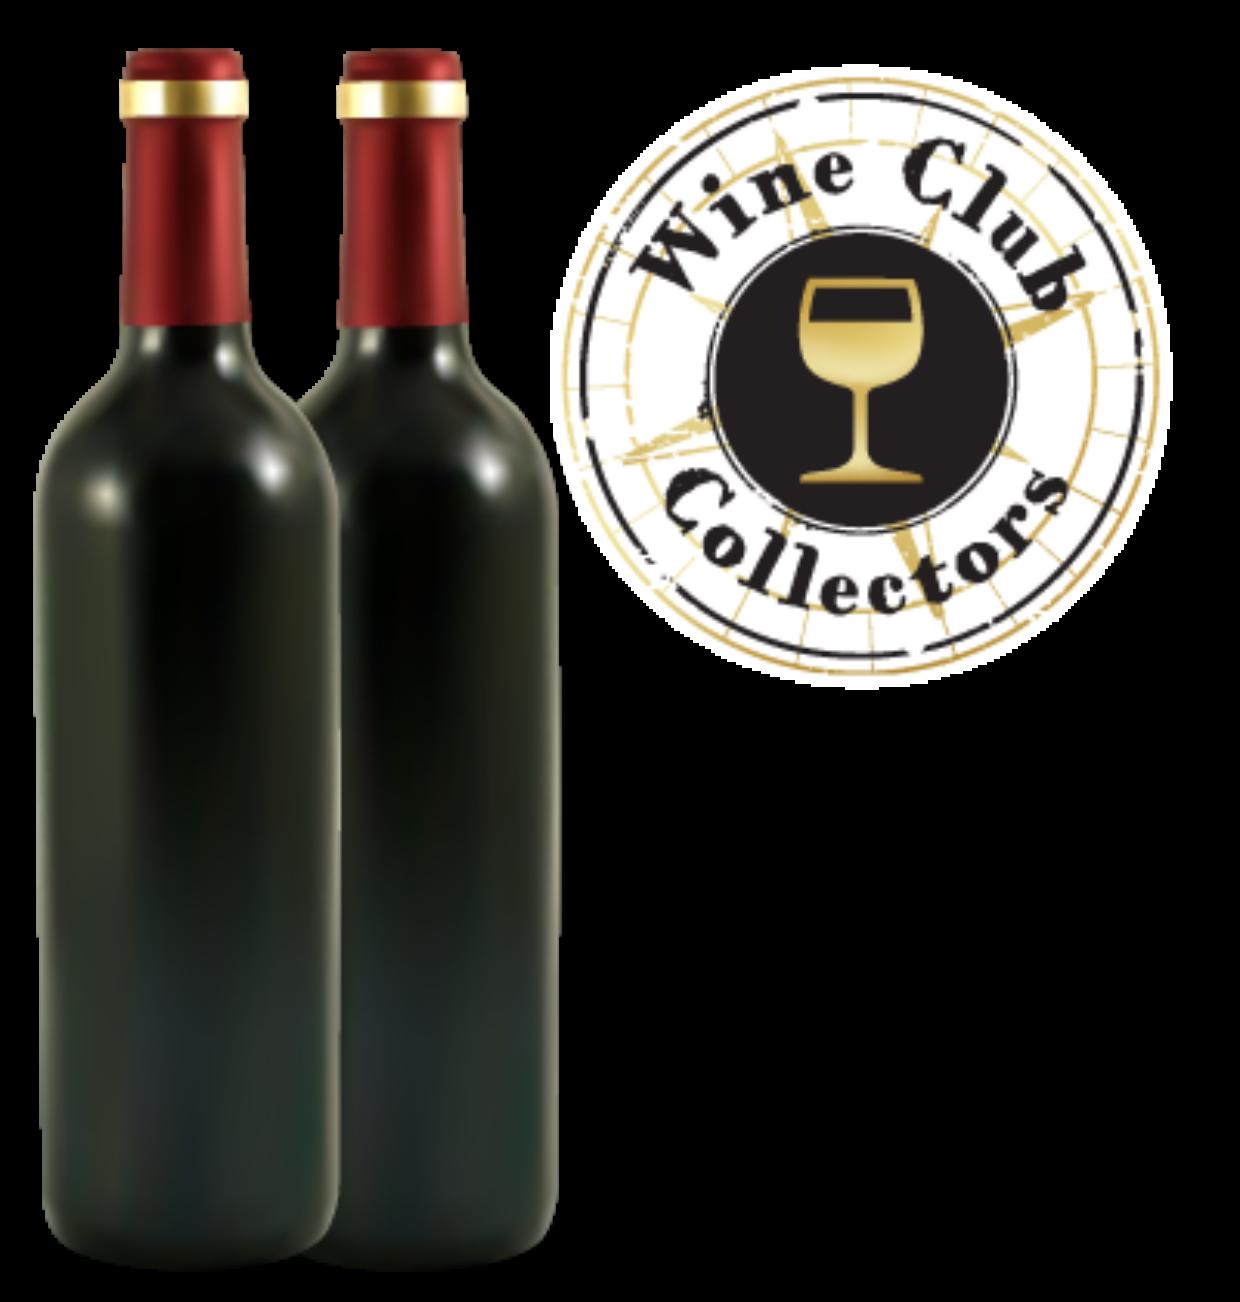 Collectors Wine Club